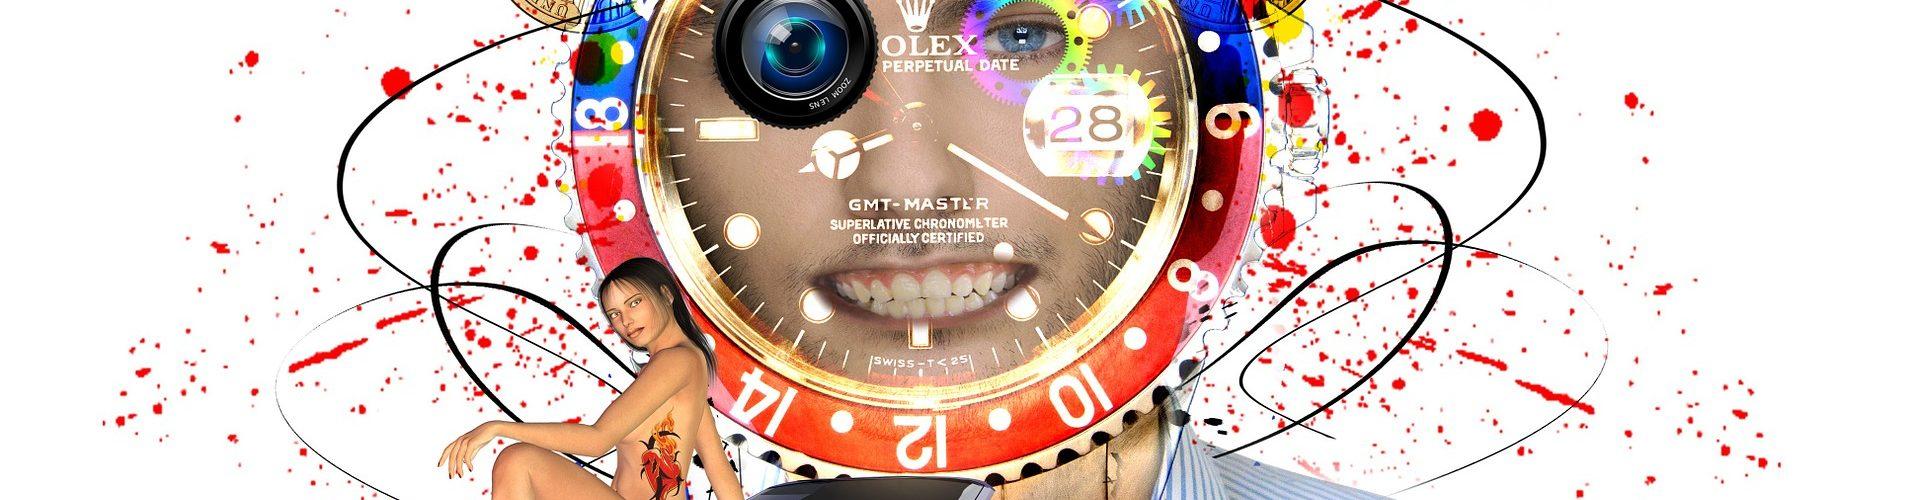 Rolex Statussymbol